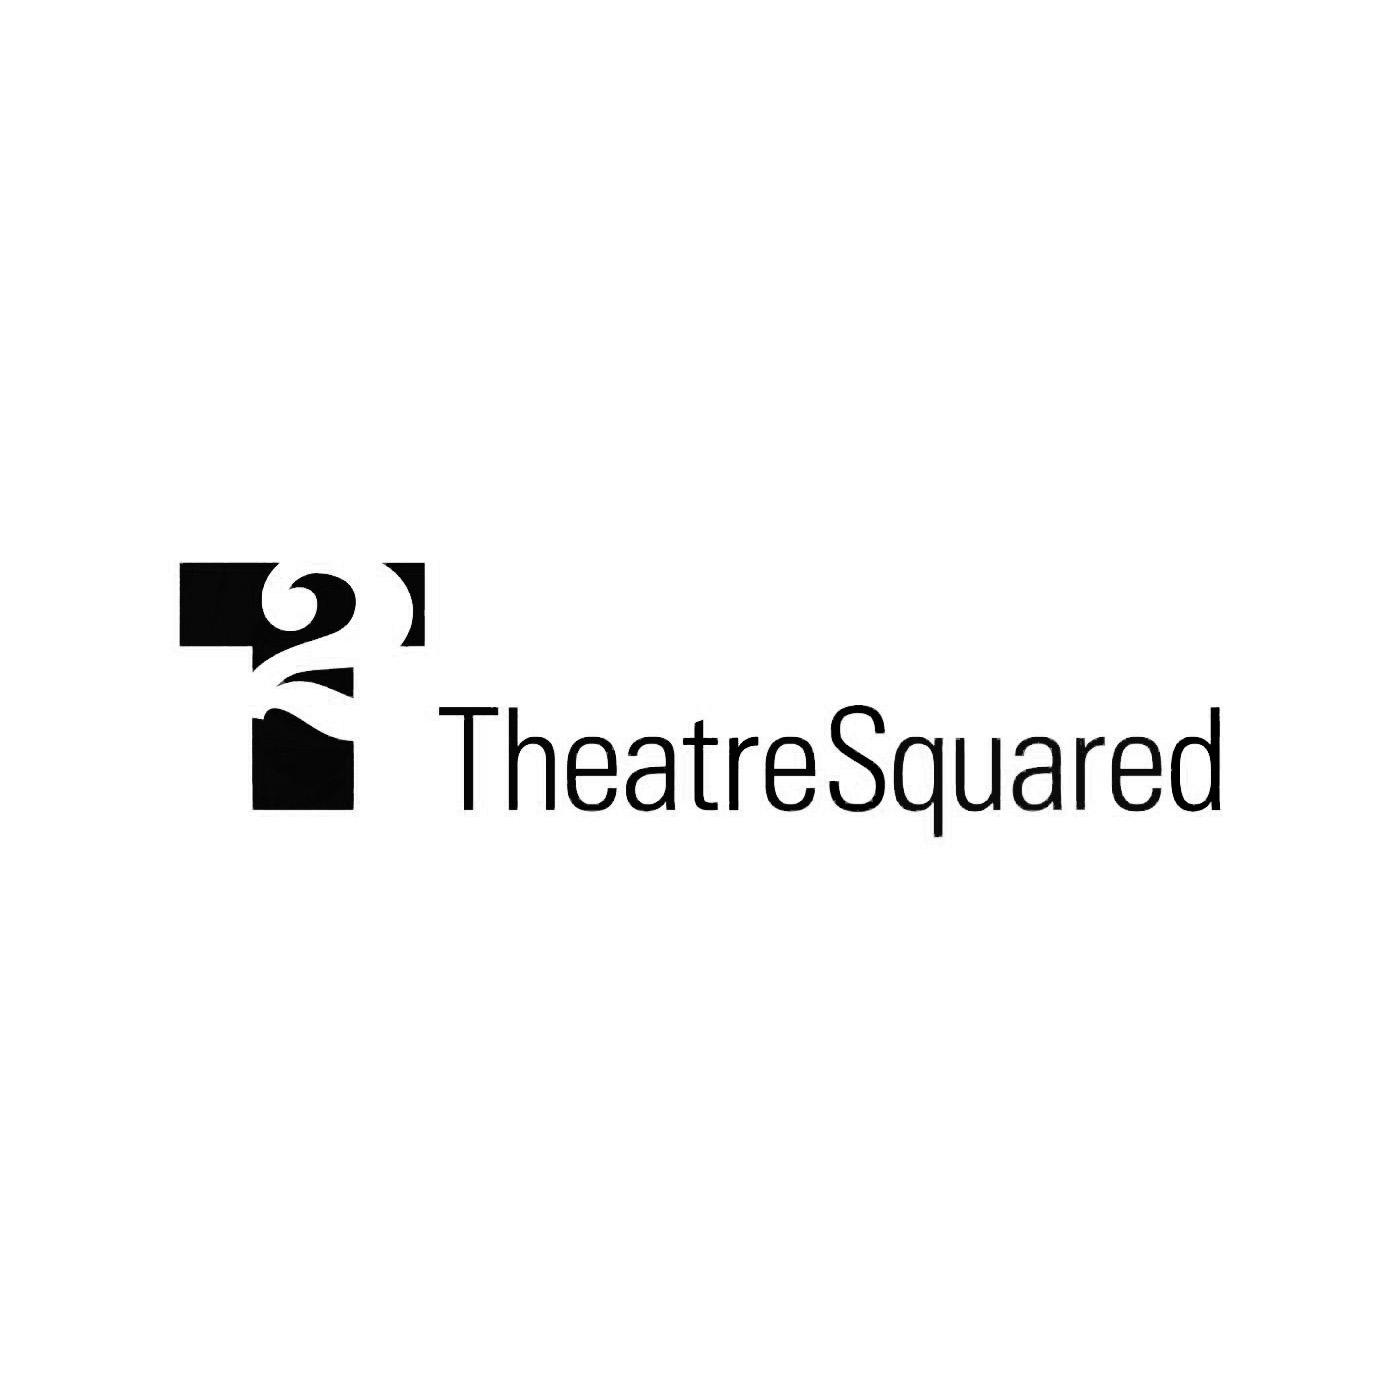 TheatreSquared.jpg